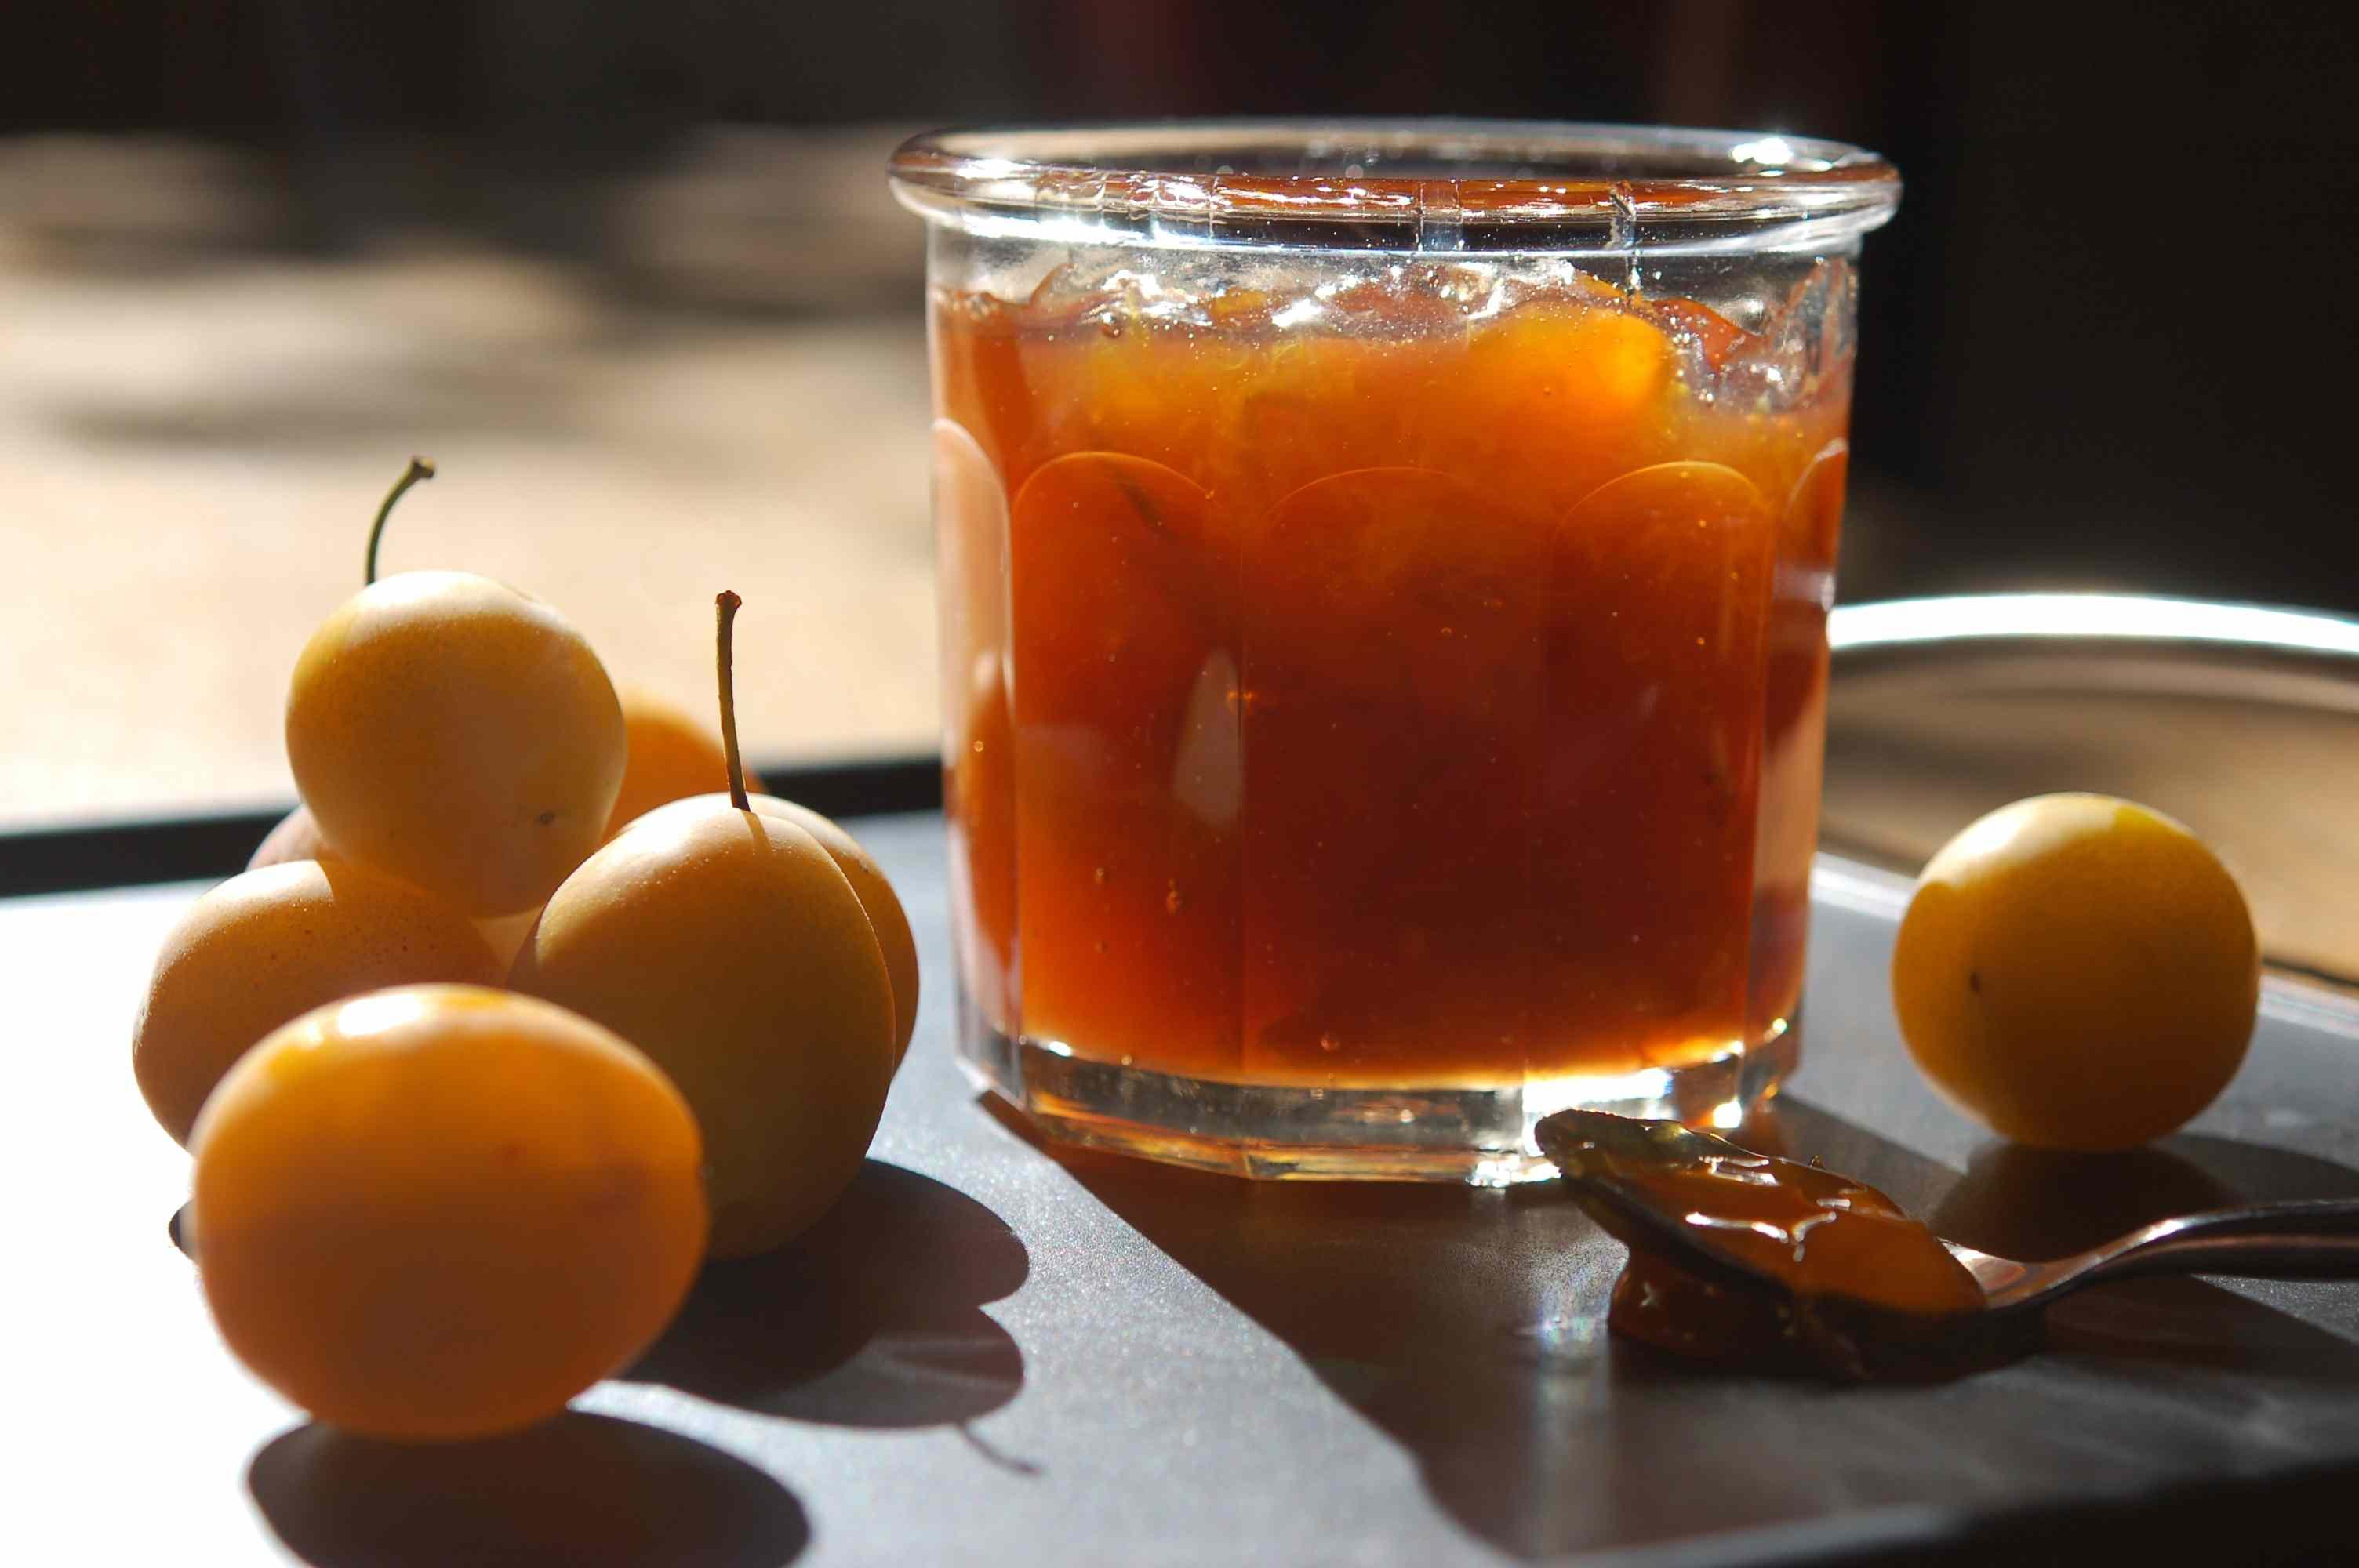 Fresh yellow plums and a jar of plum jam